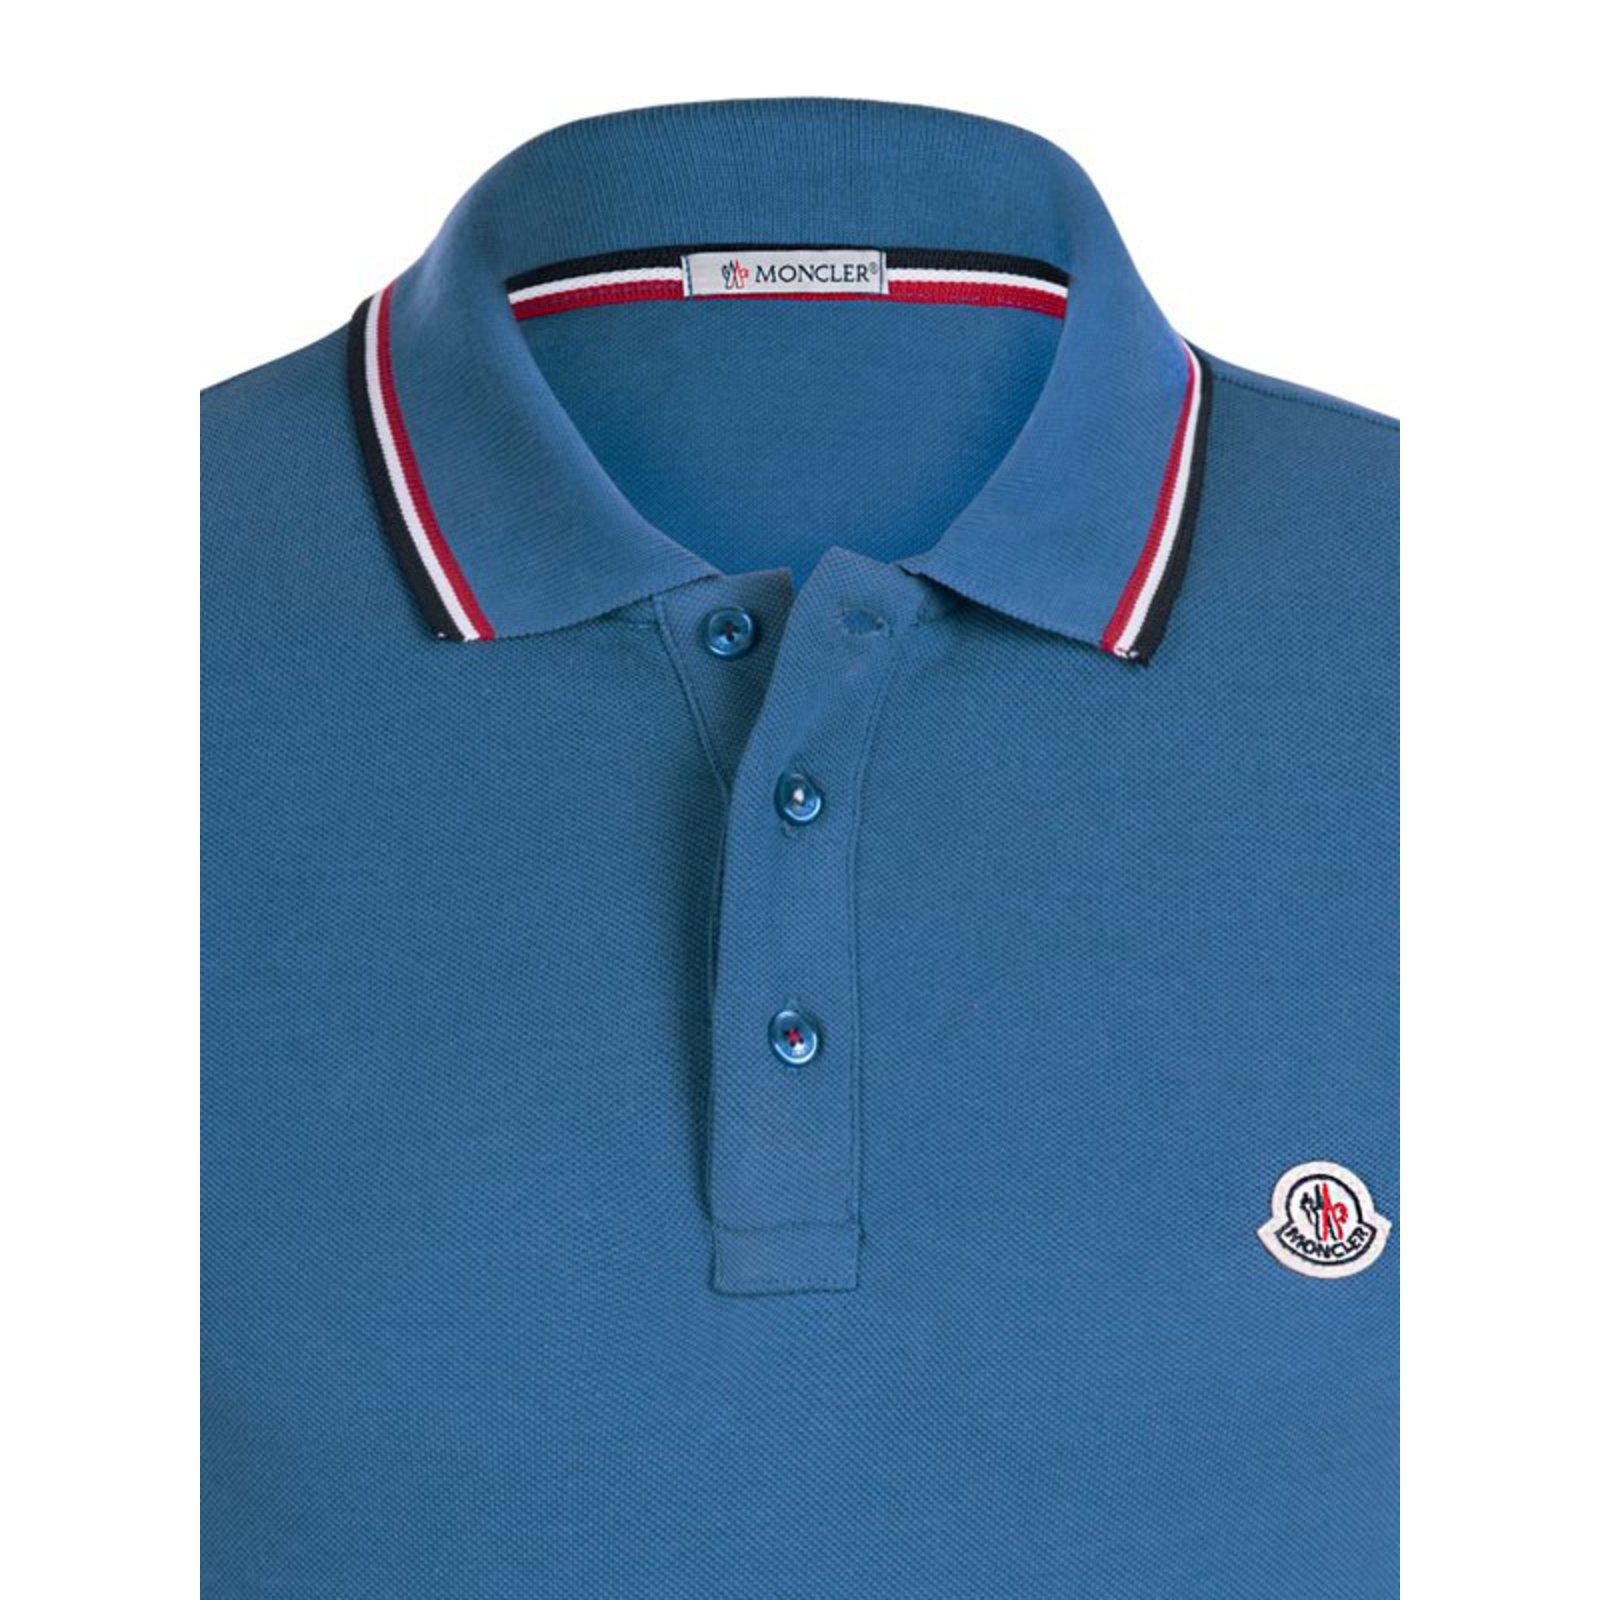 Moncler Moncler brand new polo light blue shirt eu large Polos Cotton Blue ref.36728 - Joli Closet